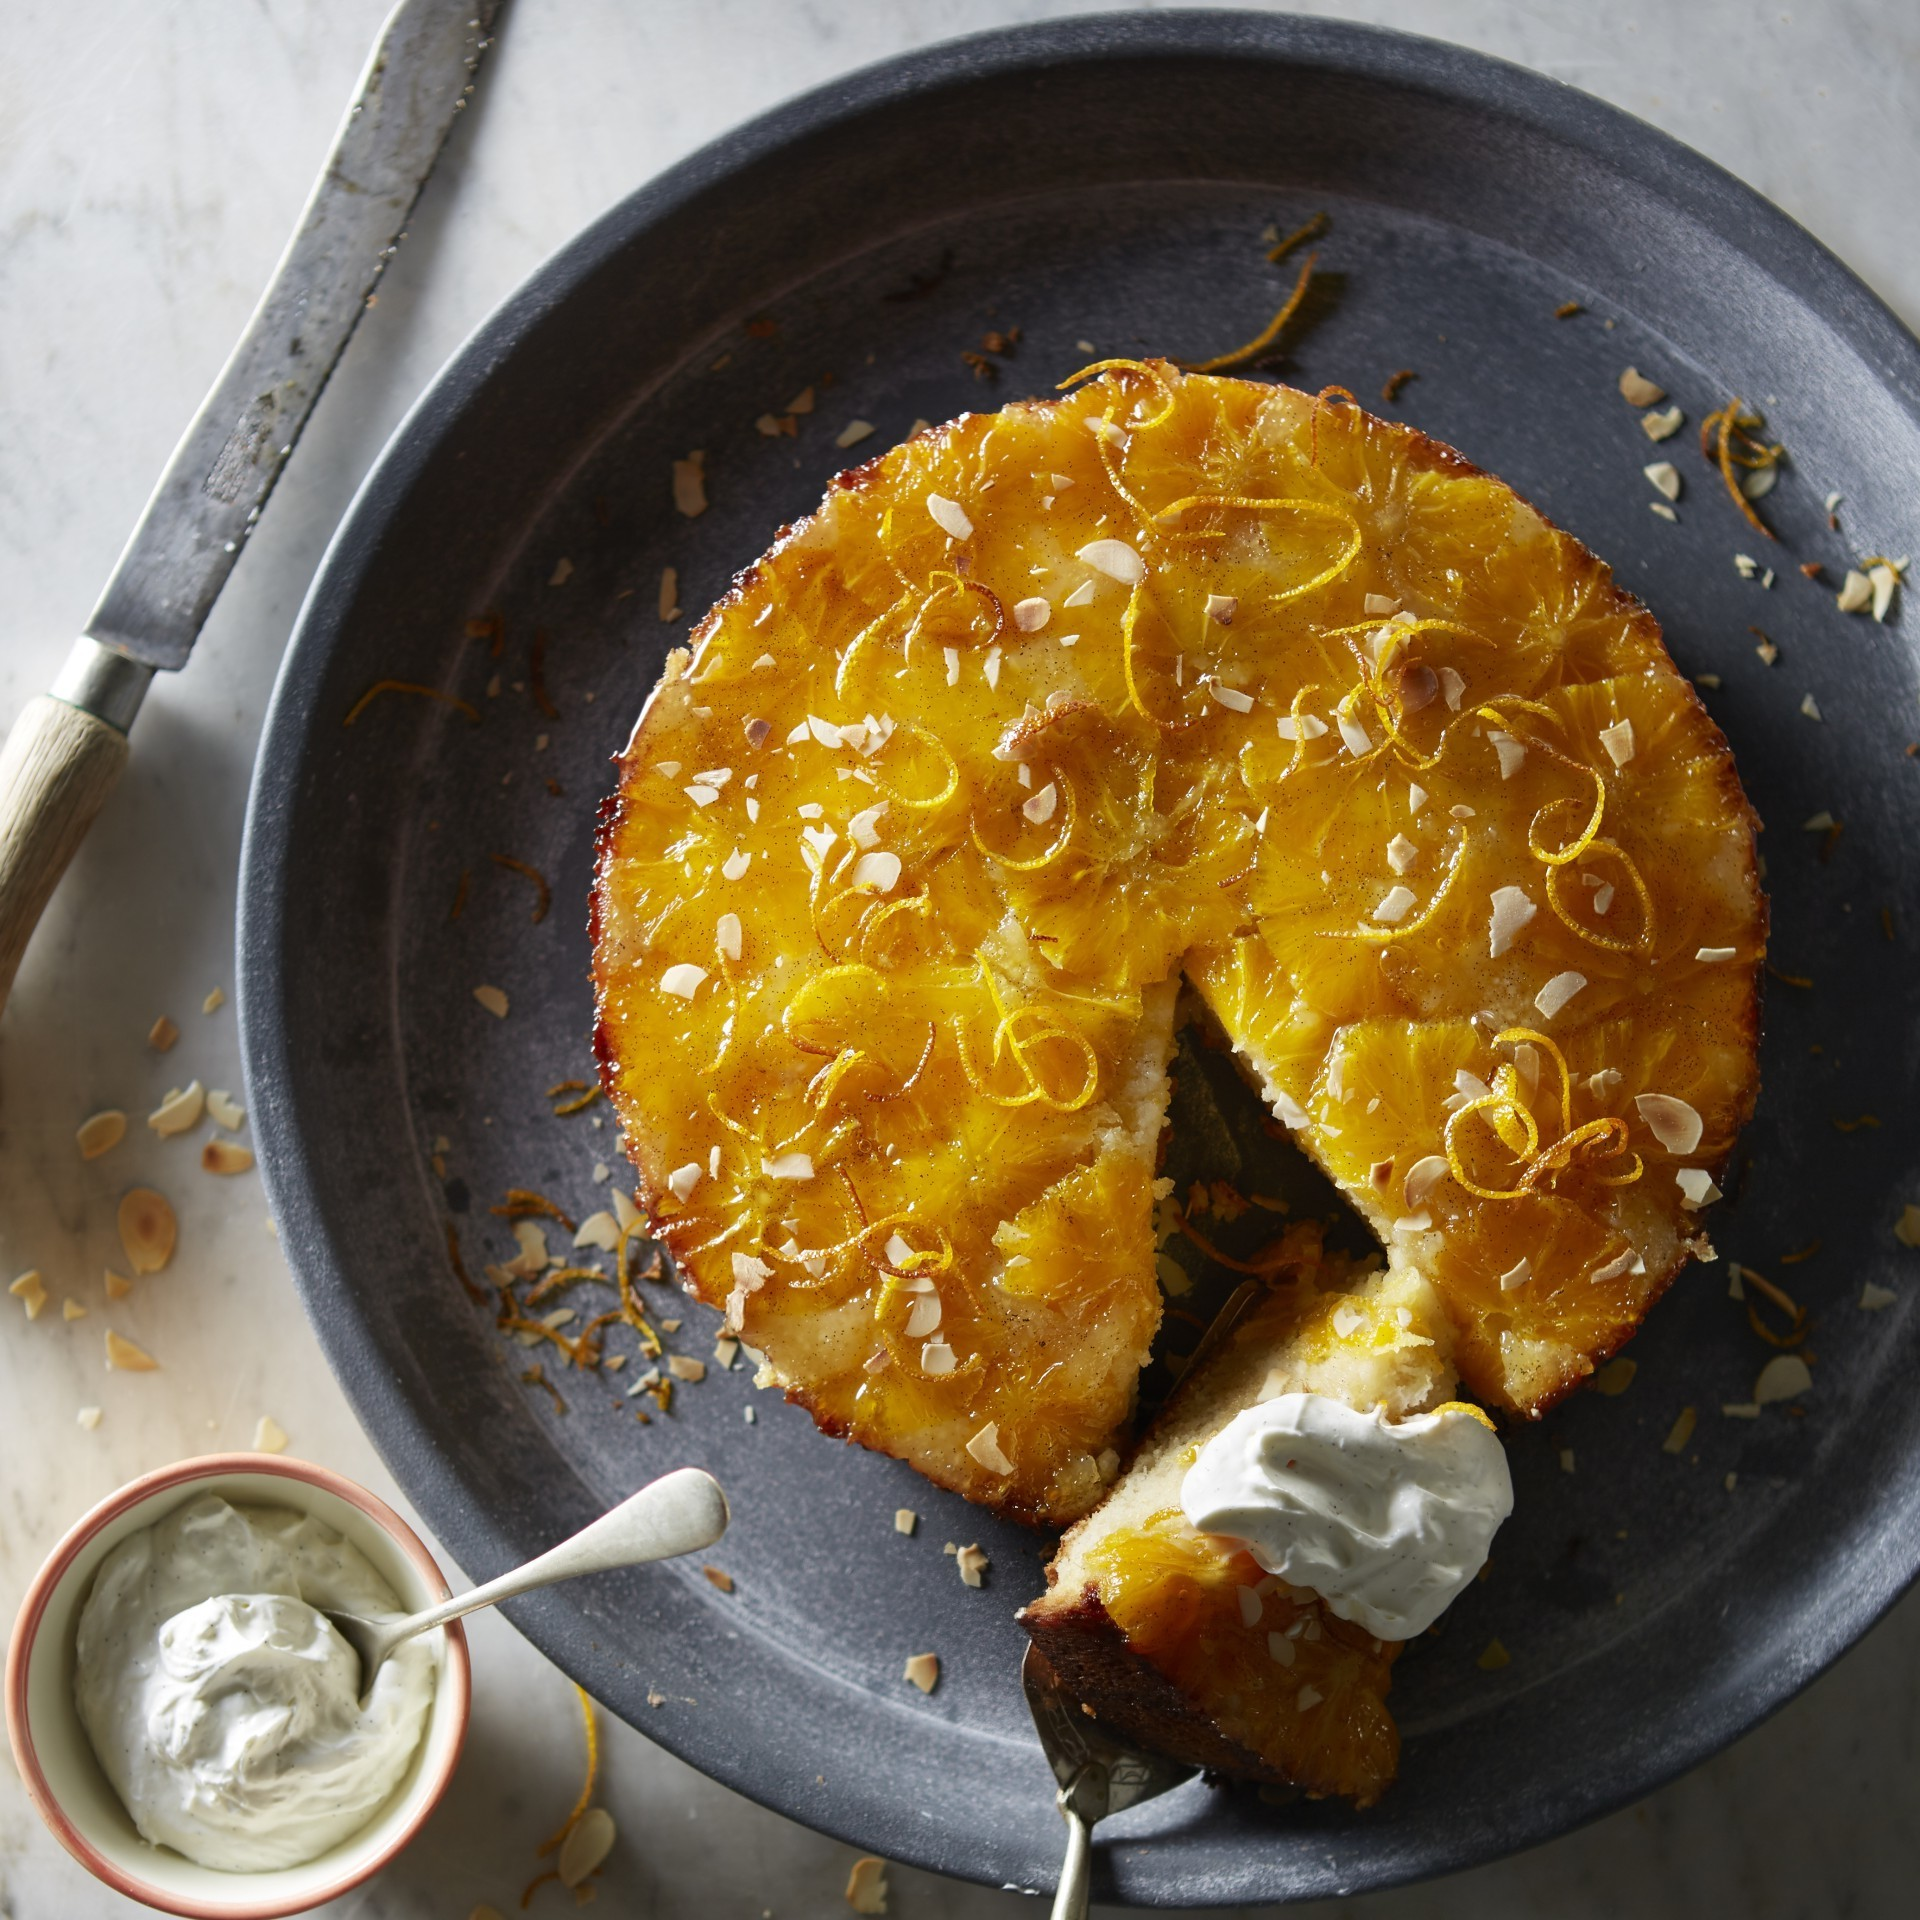 Vanilyalı krema ile portakallı turta